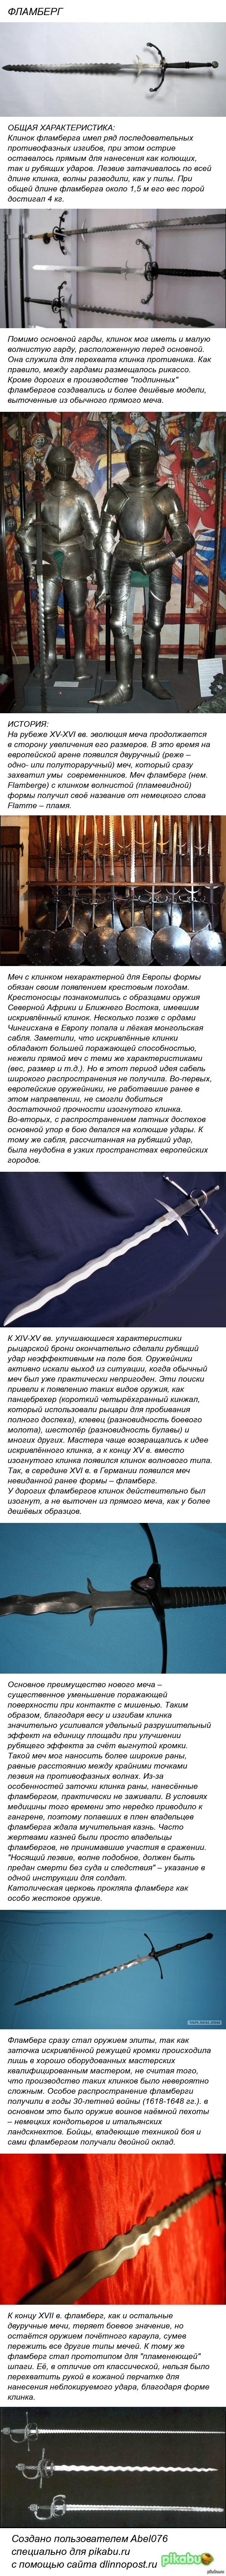 ФЛАМБЕРГ Седьмой длиннопост. Всем спасибо)))